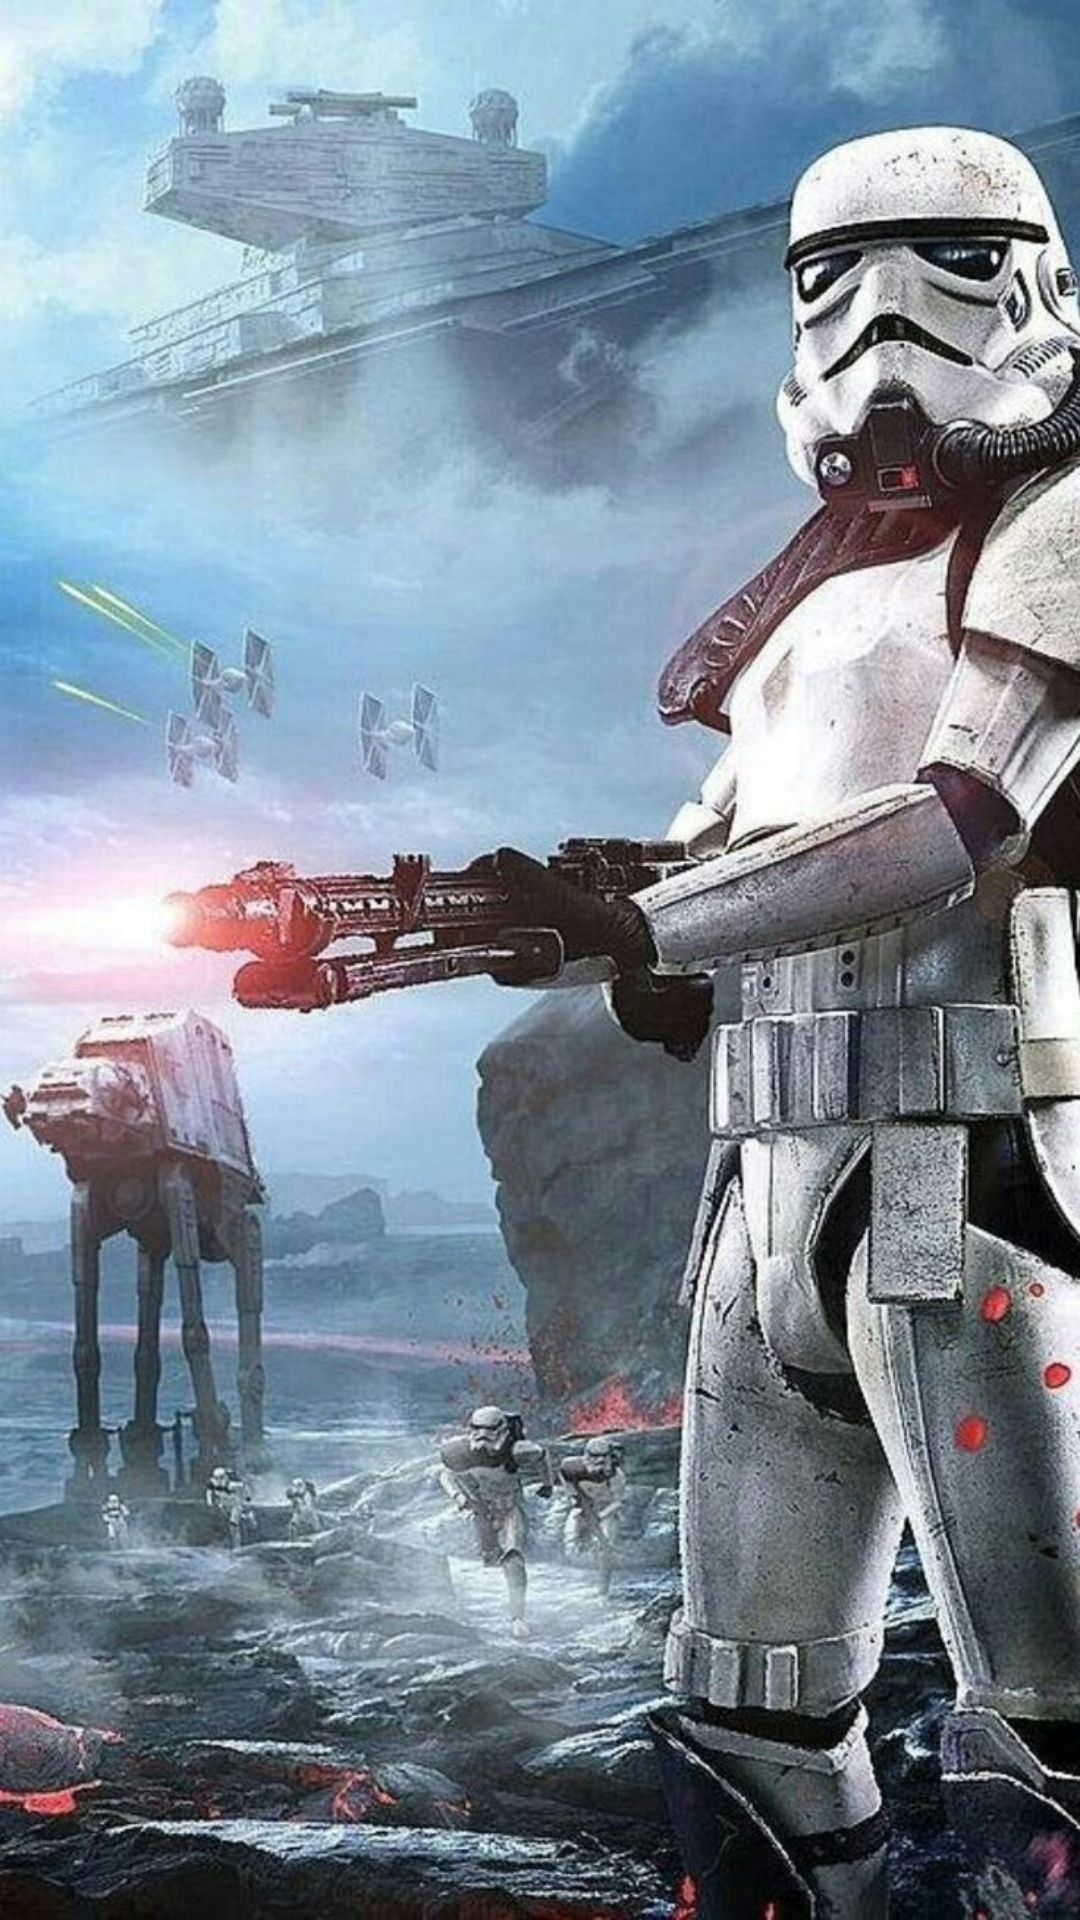 Coleo Star Wars, Wars Personagens, Imagens Naves Espaciai